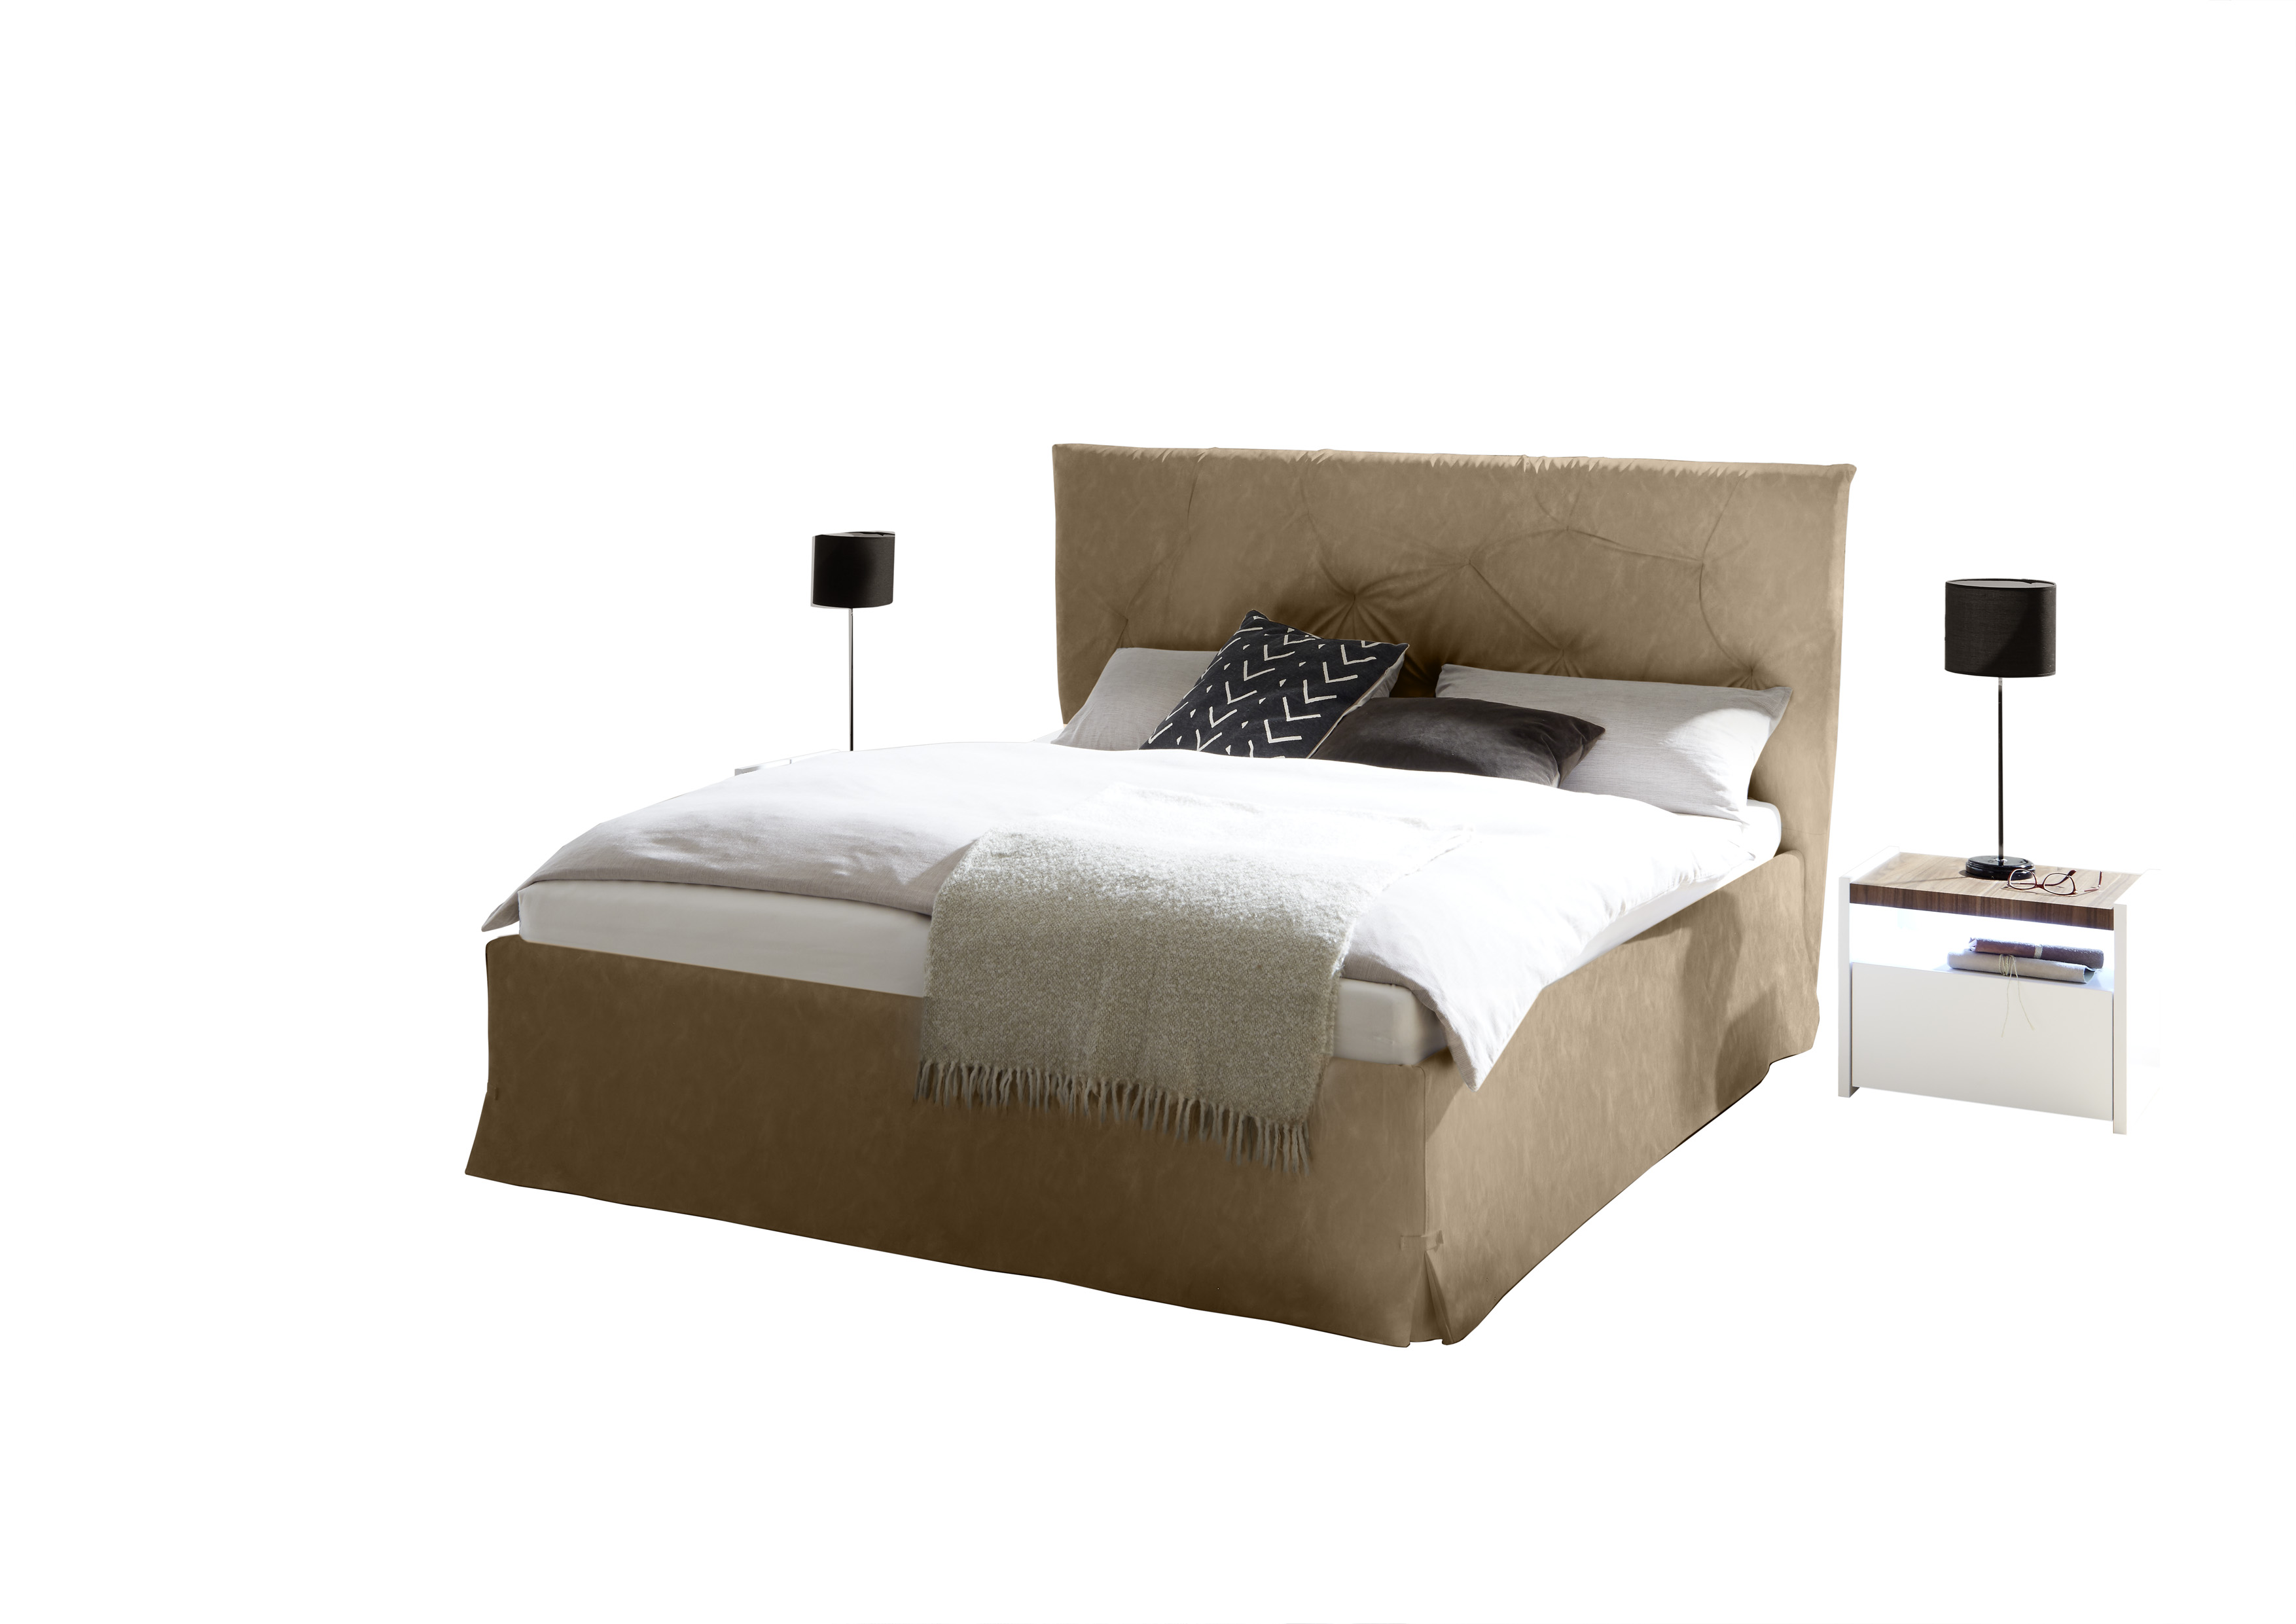 Modernes Bett Kunstleder Braun Luana Alpaca 160x200